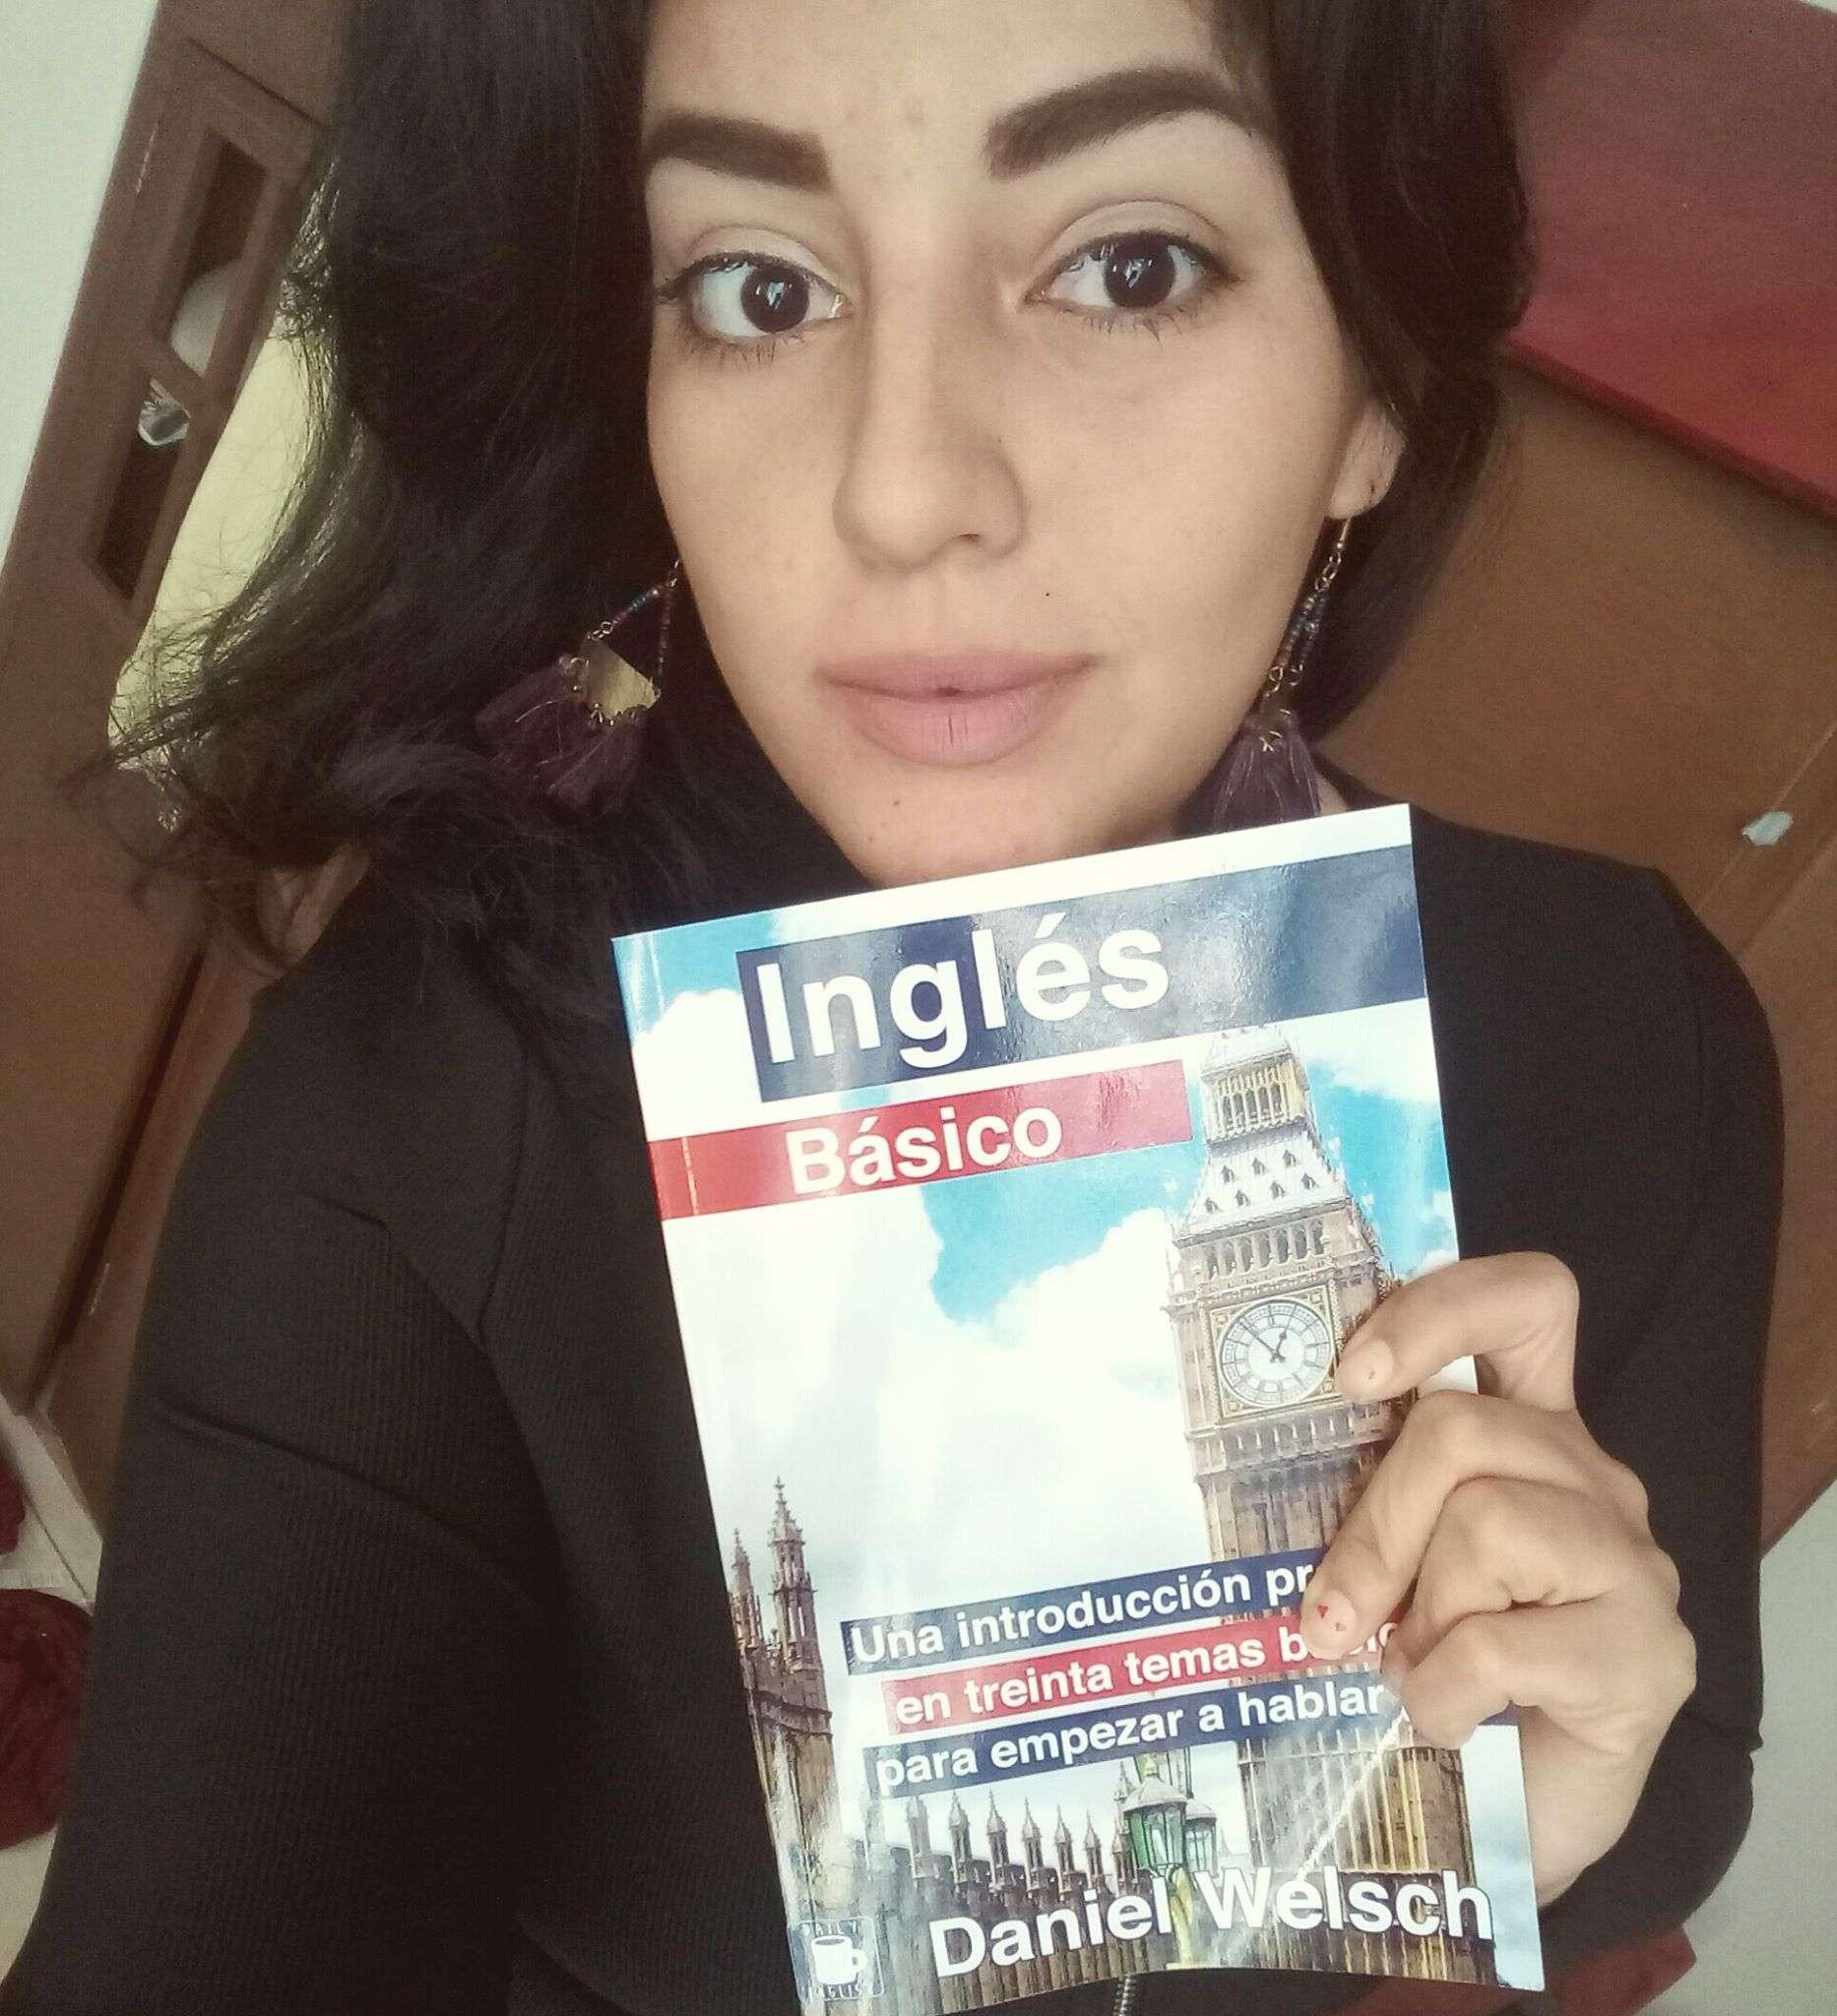 pdfs de inglés básico gratis